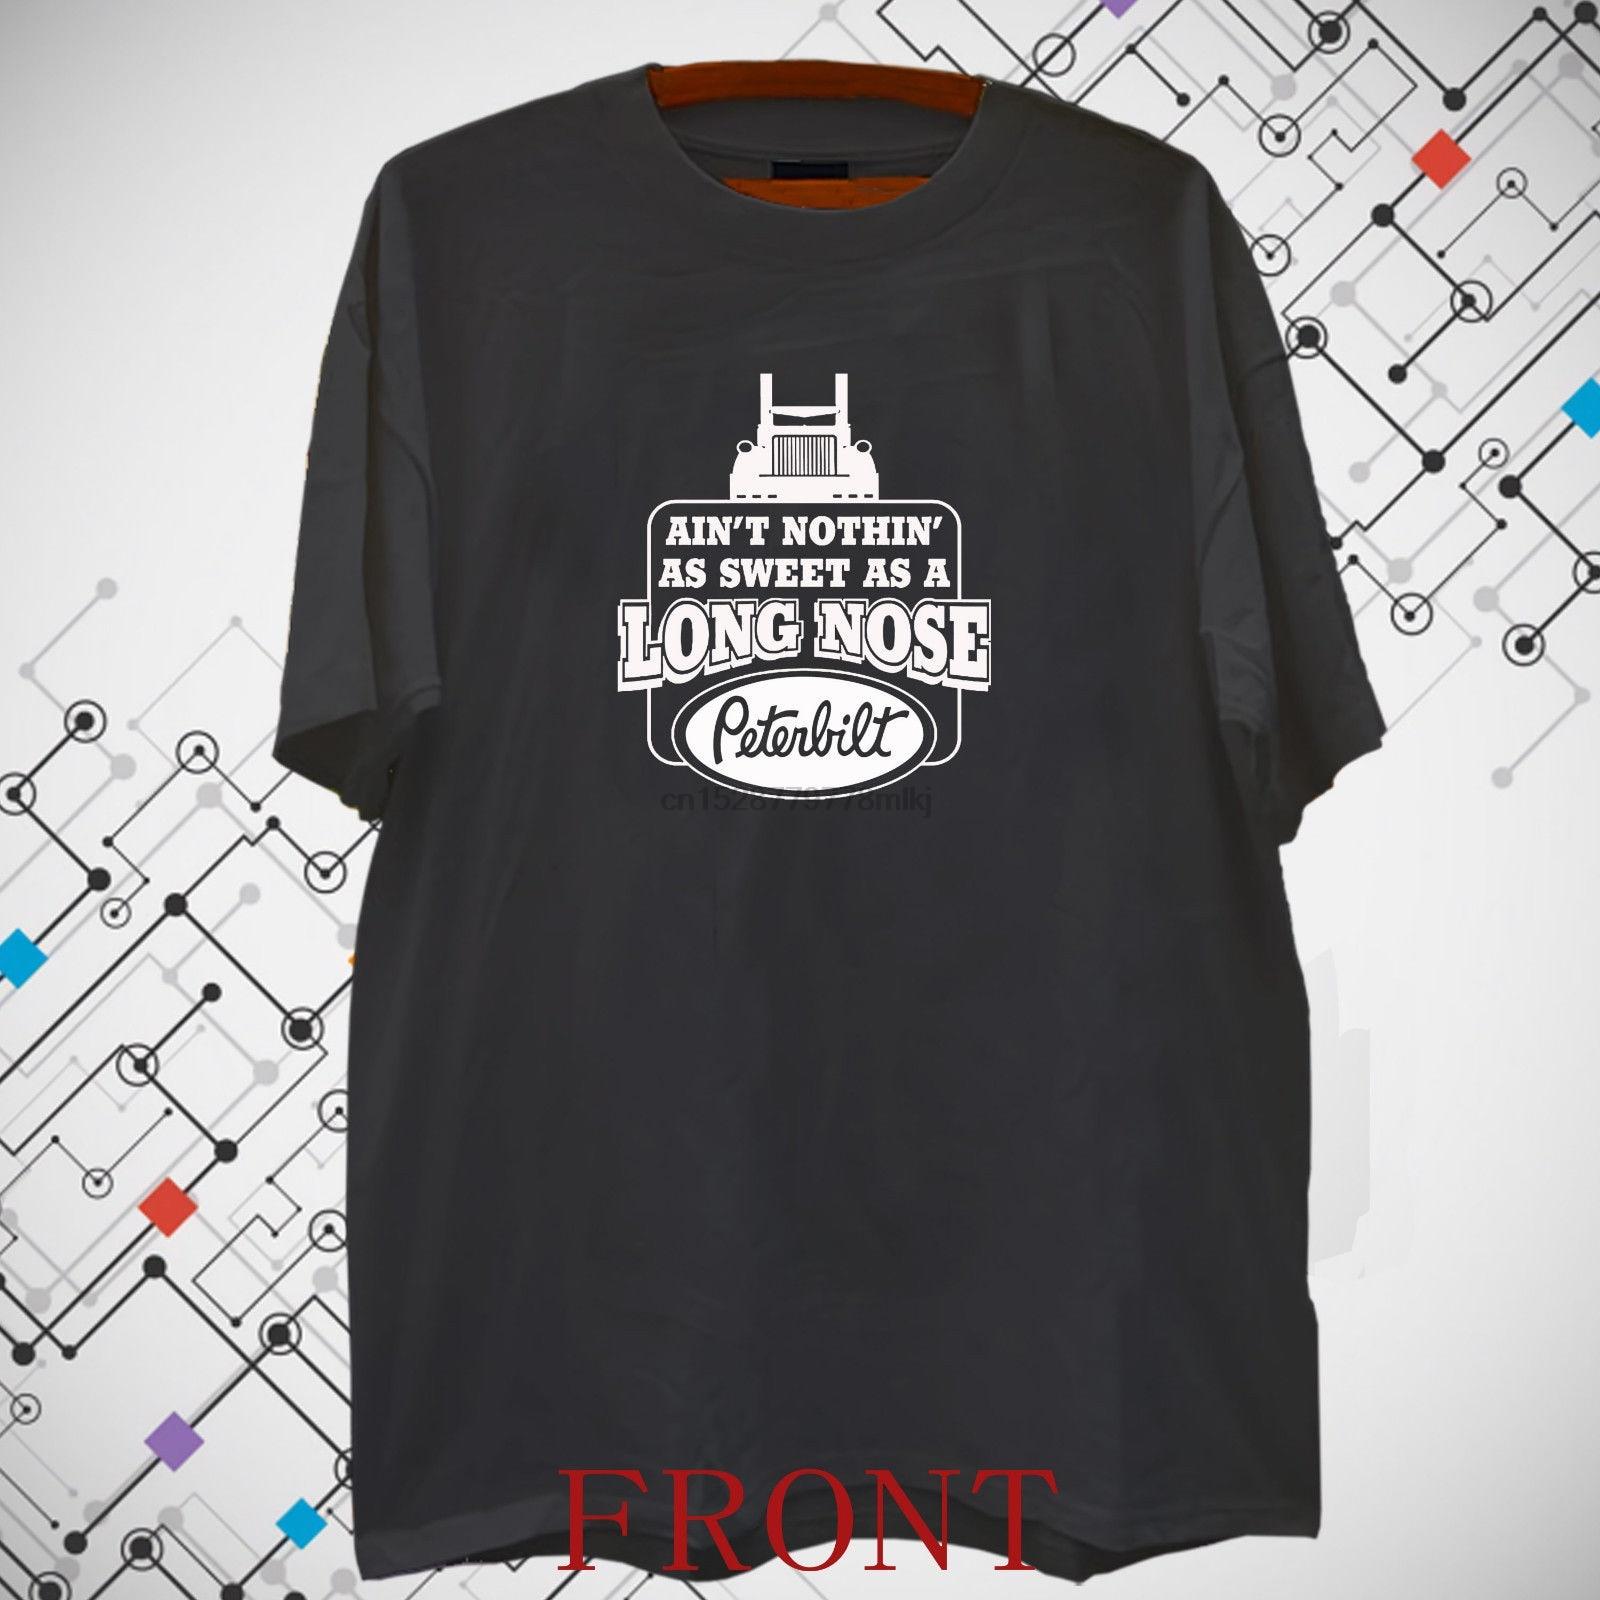 Mack Trucker Trucks Logo Long Sleeve Black T-Shirt Size S to 3XL